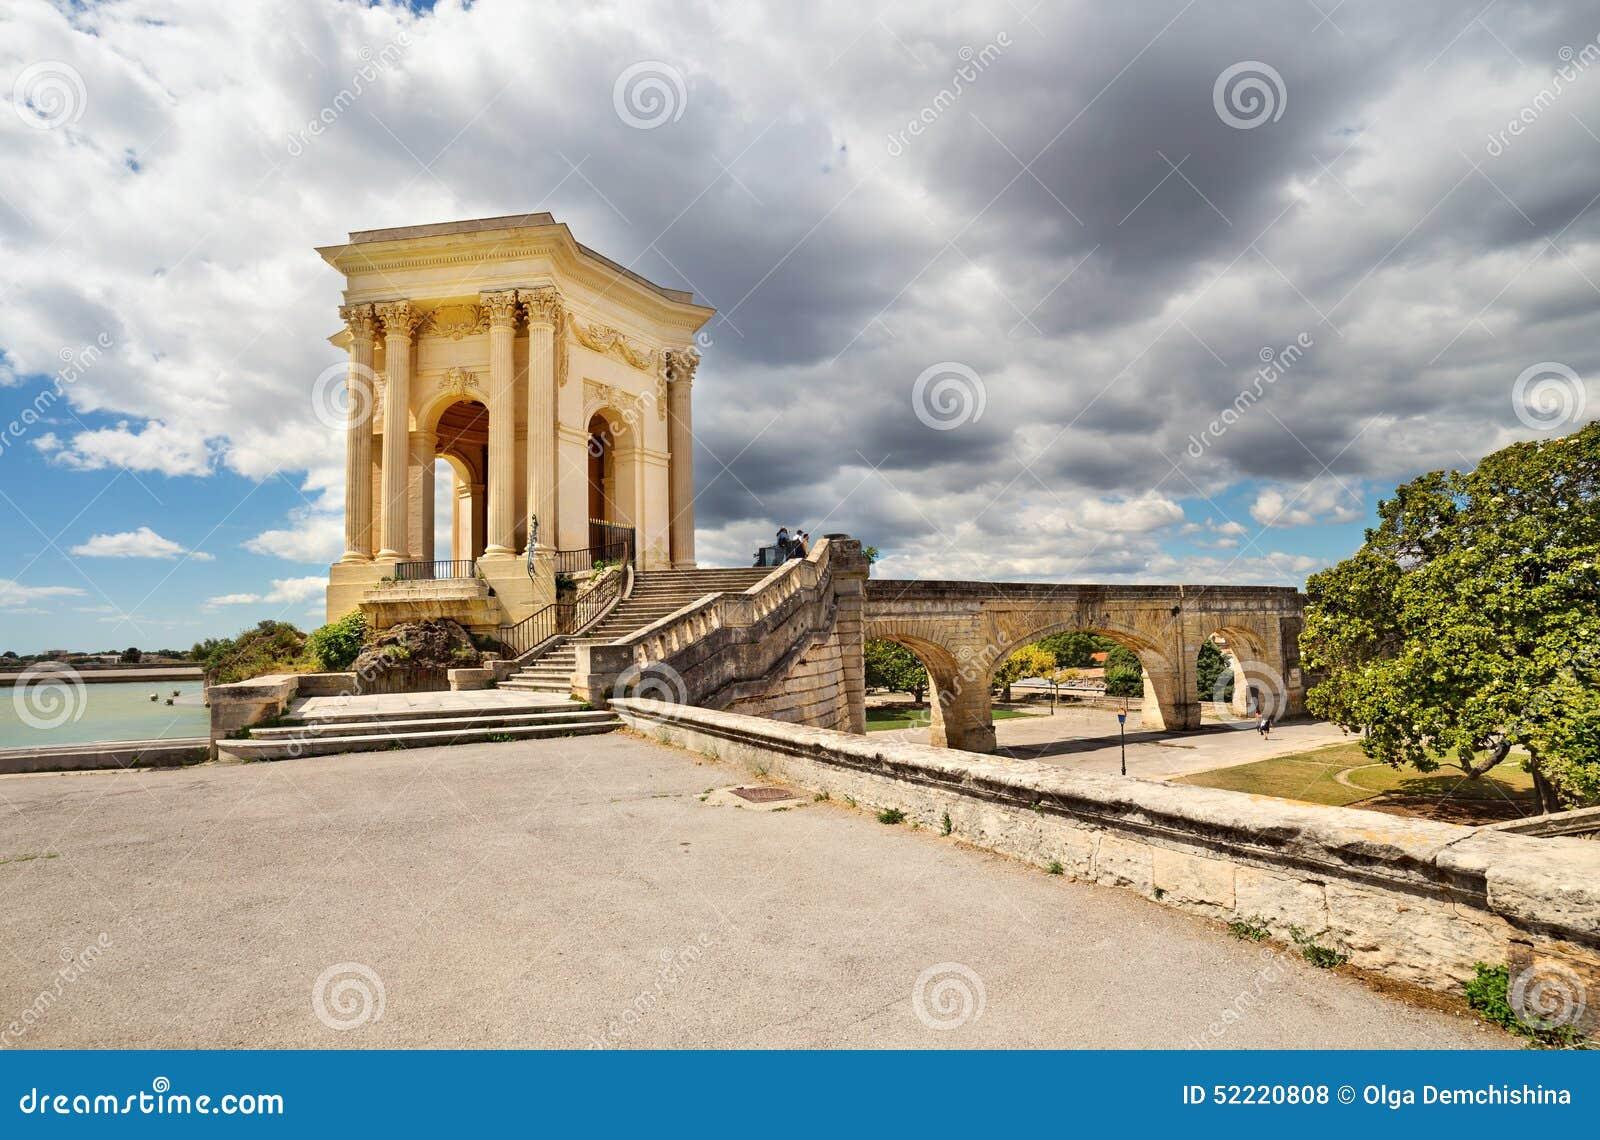 The Languedoc Forum